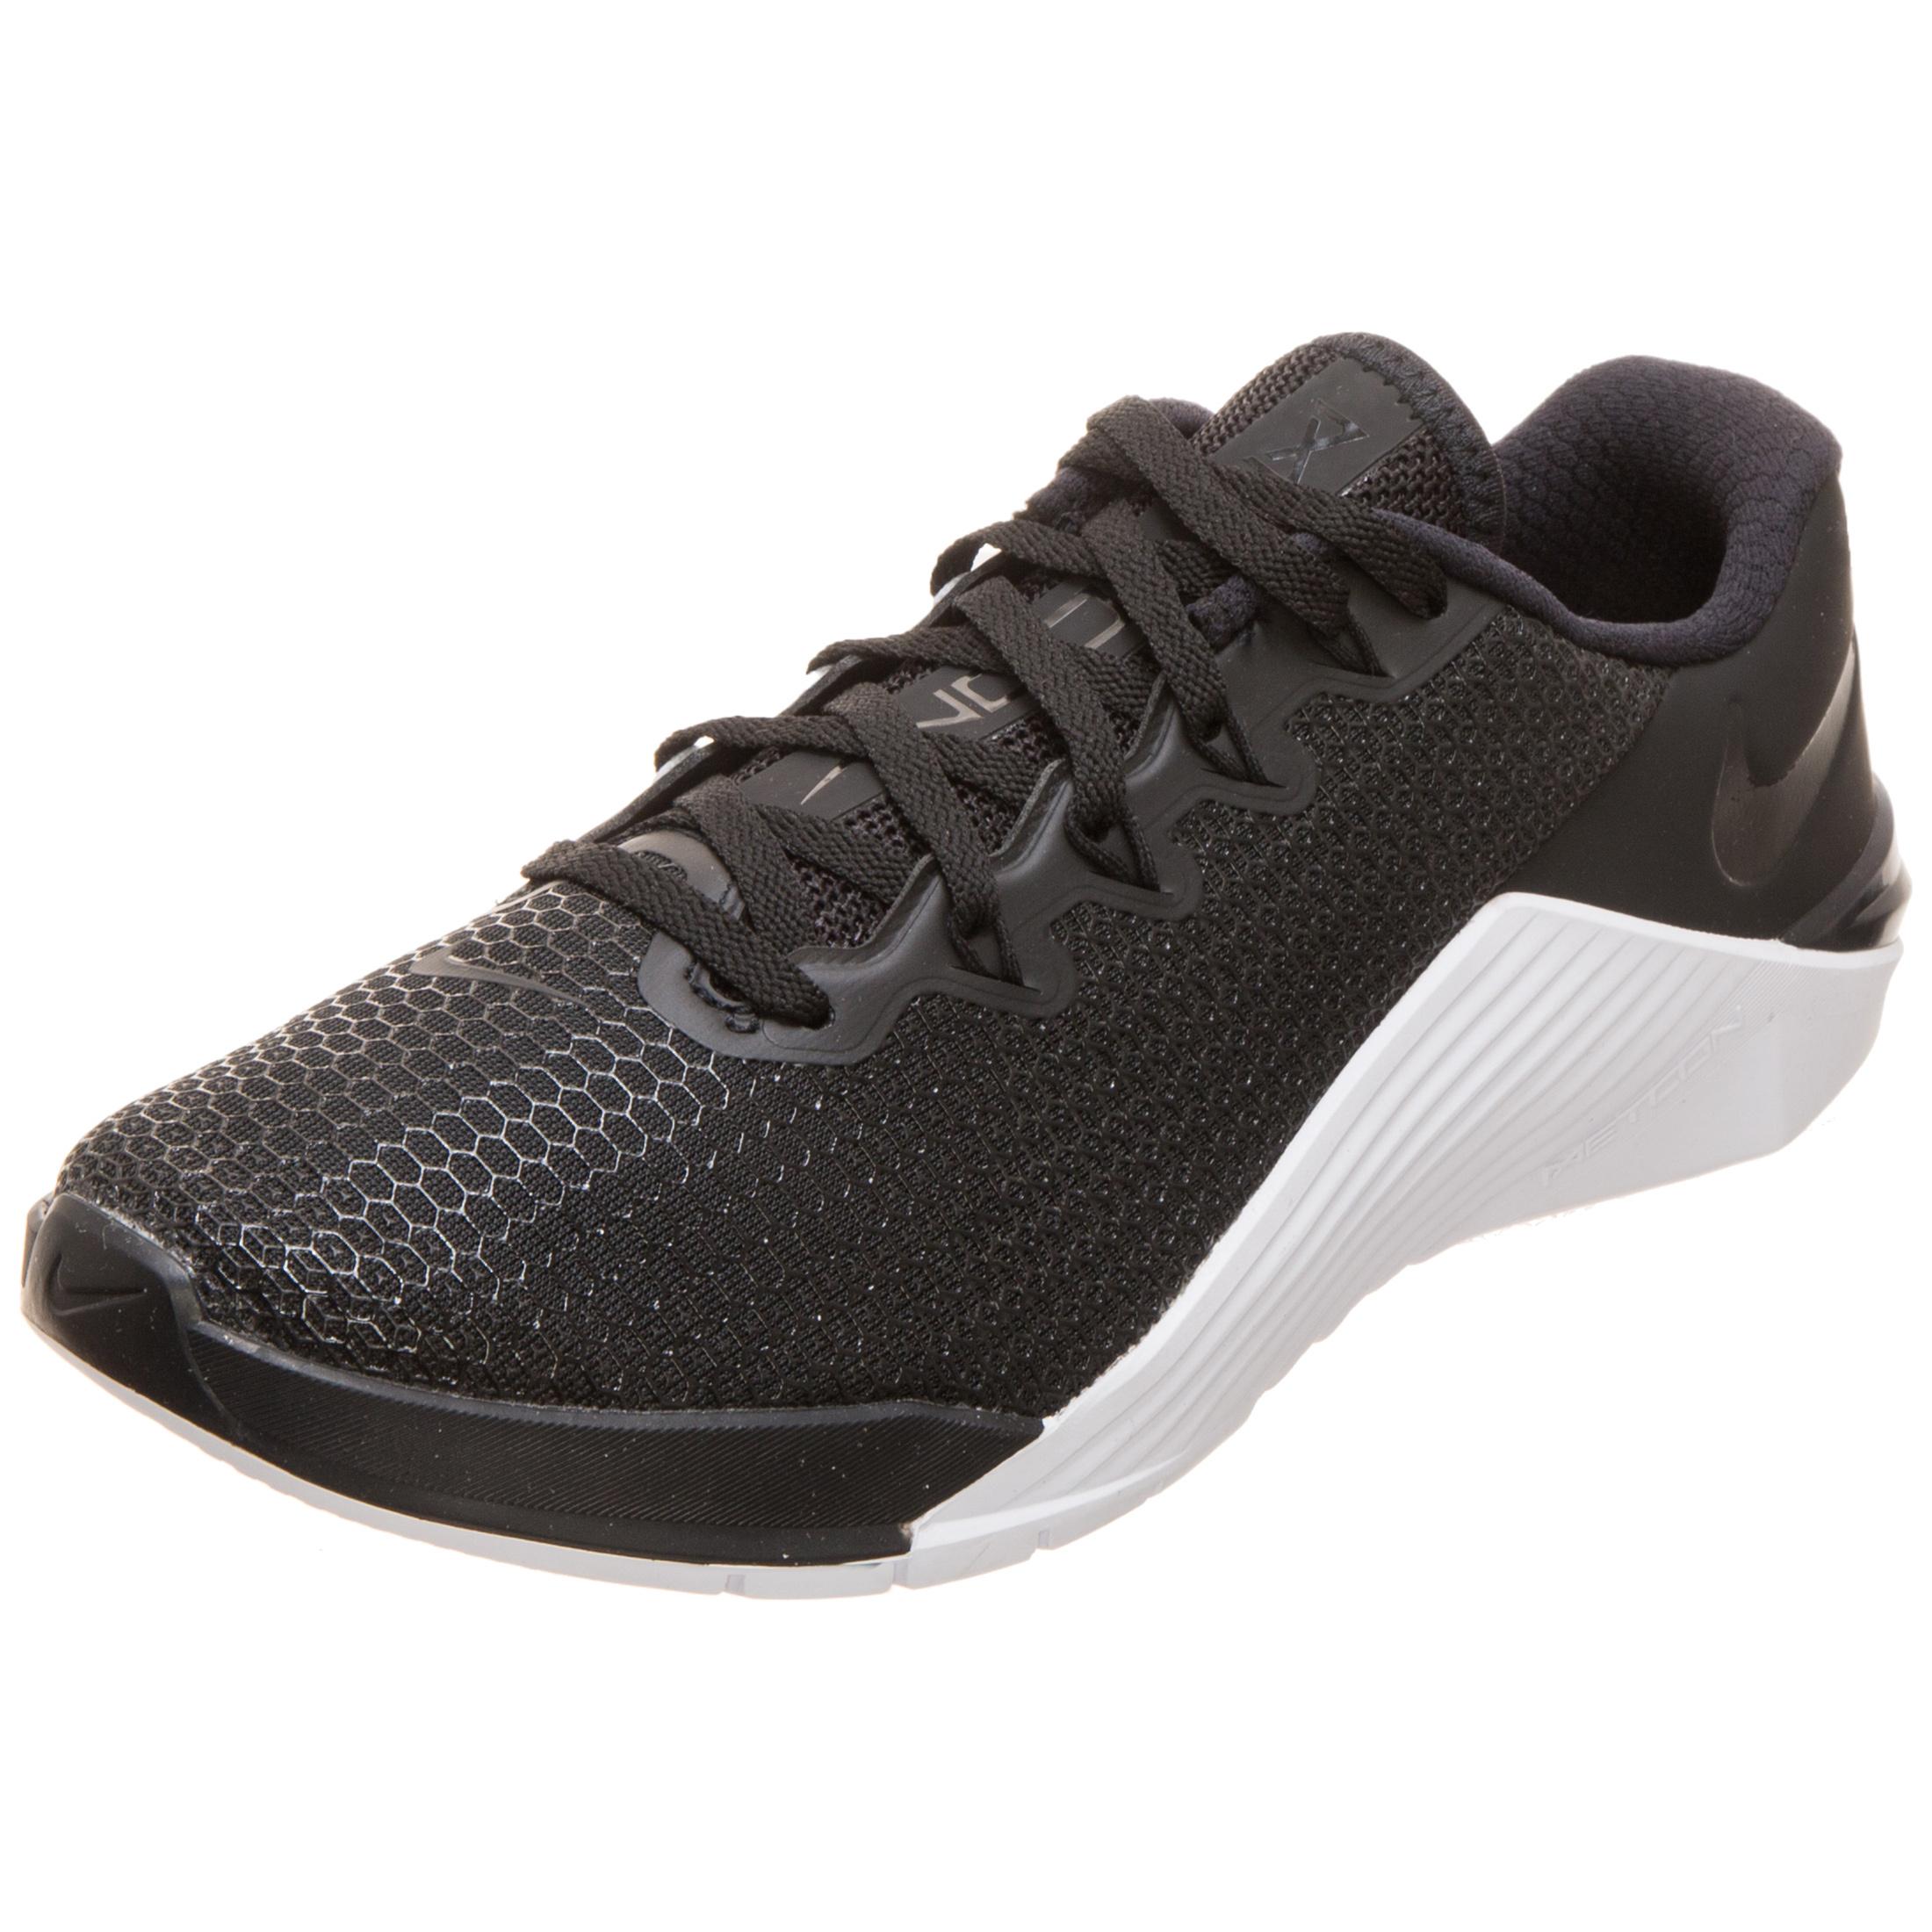 Buy Nike Metcon 5 Women from £74.90